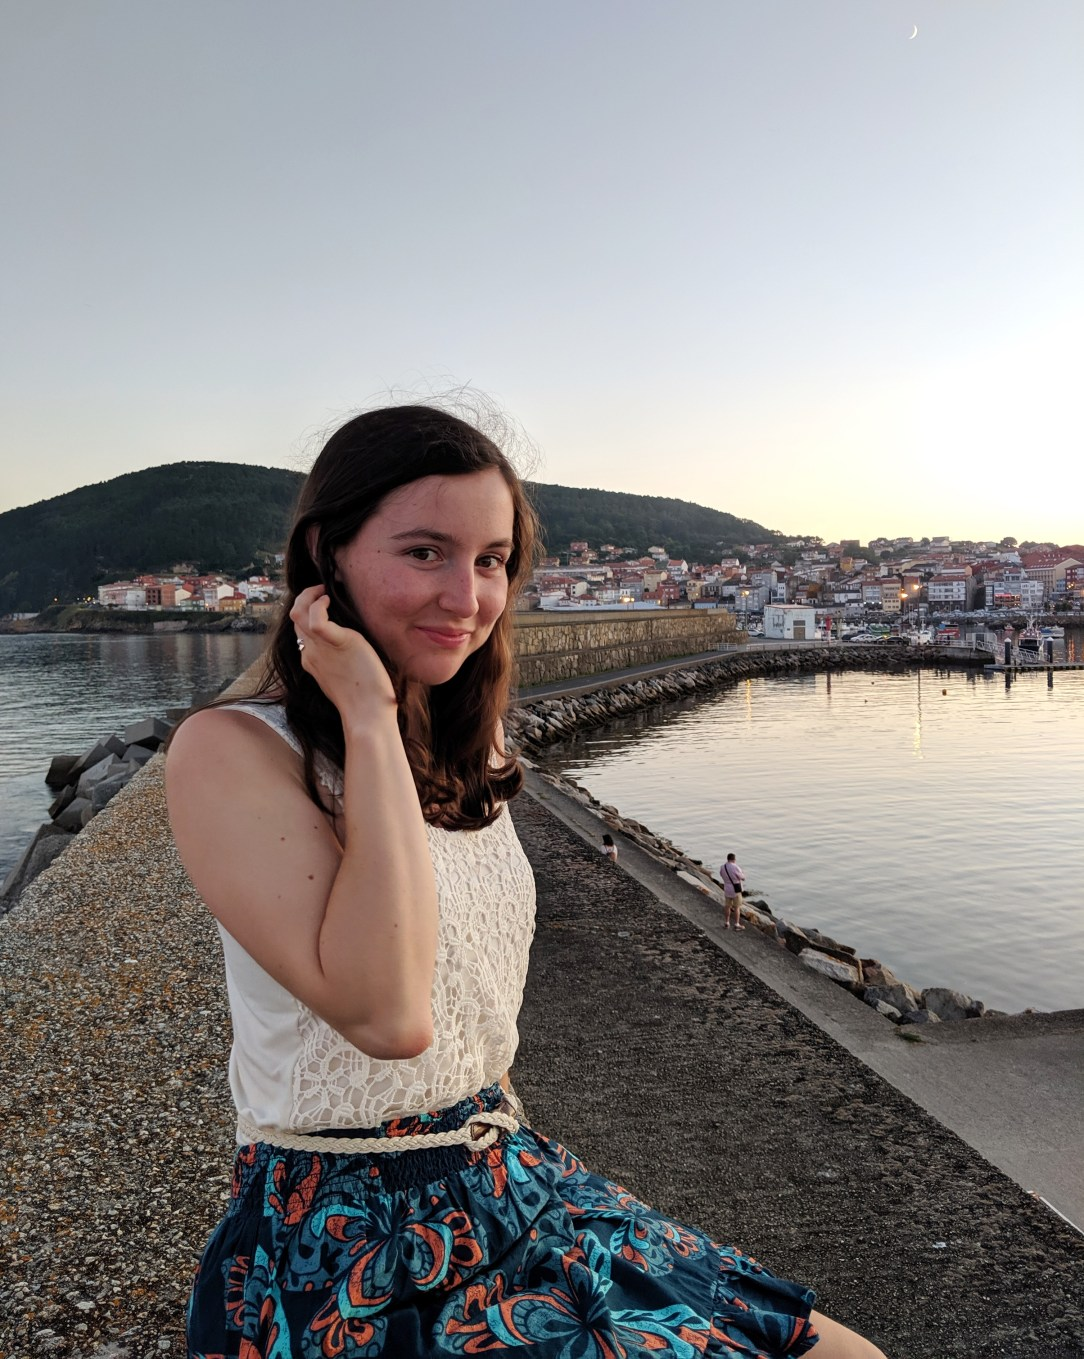 crochet top, patterned skirt, coastal town, Spain